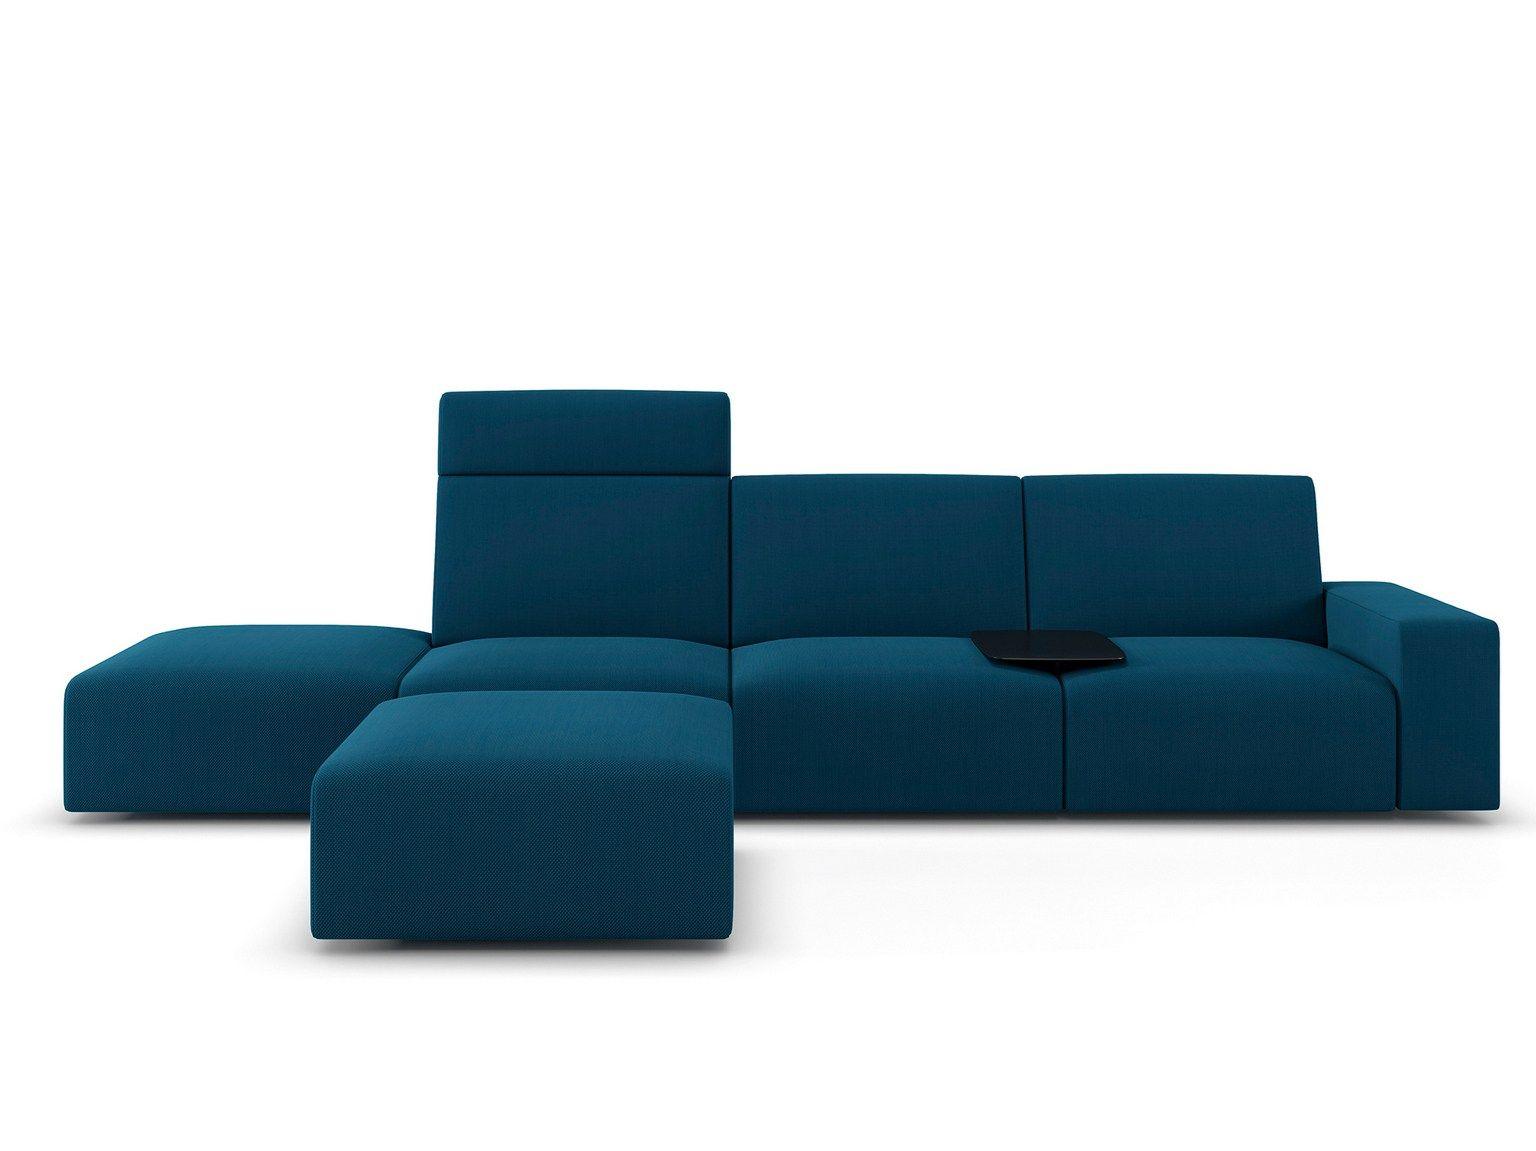 Modulares Sofa modular sofa sistema by viccarbe design lievore altherr molina